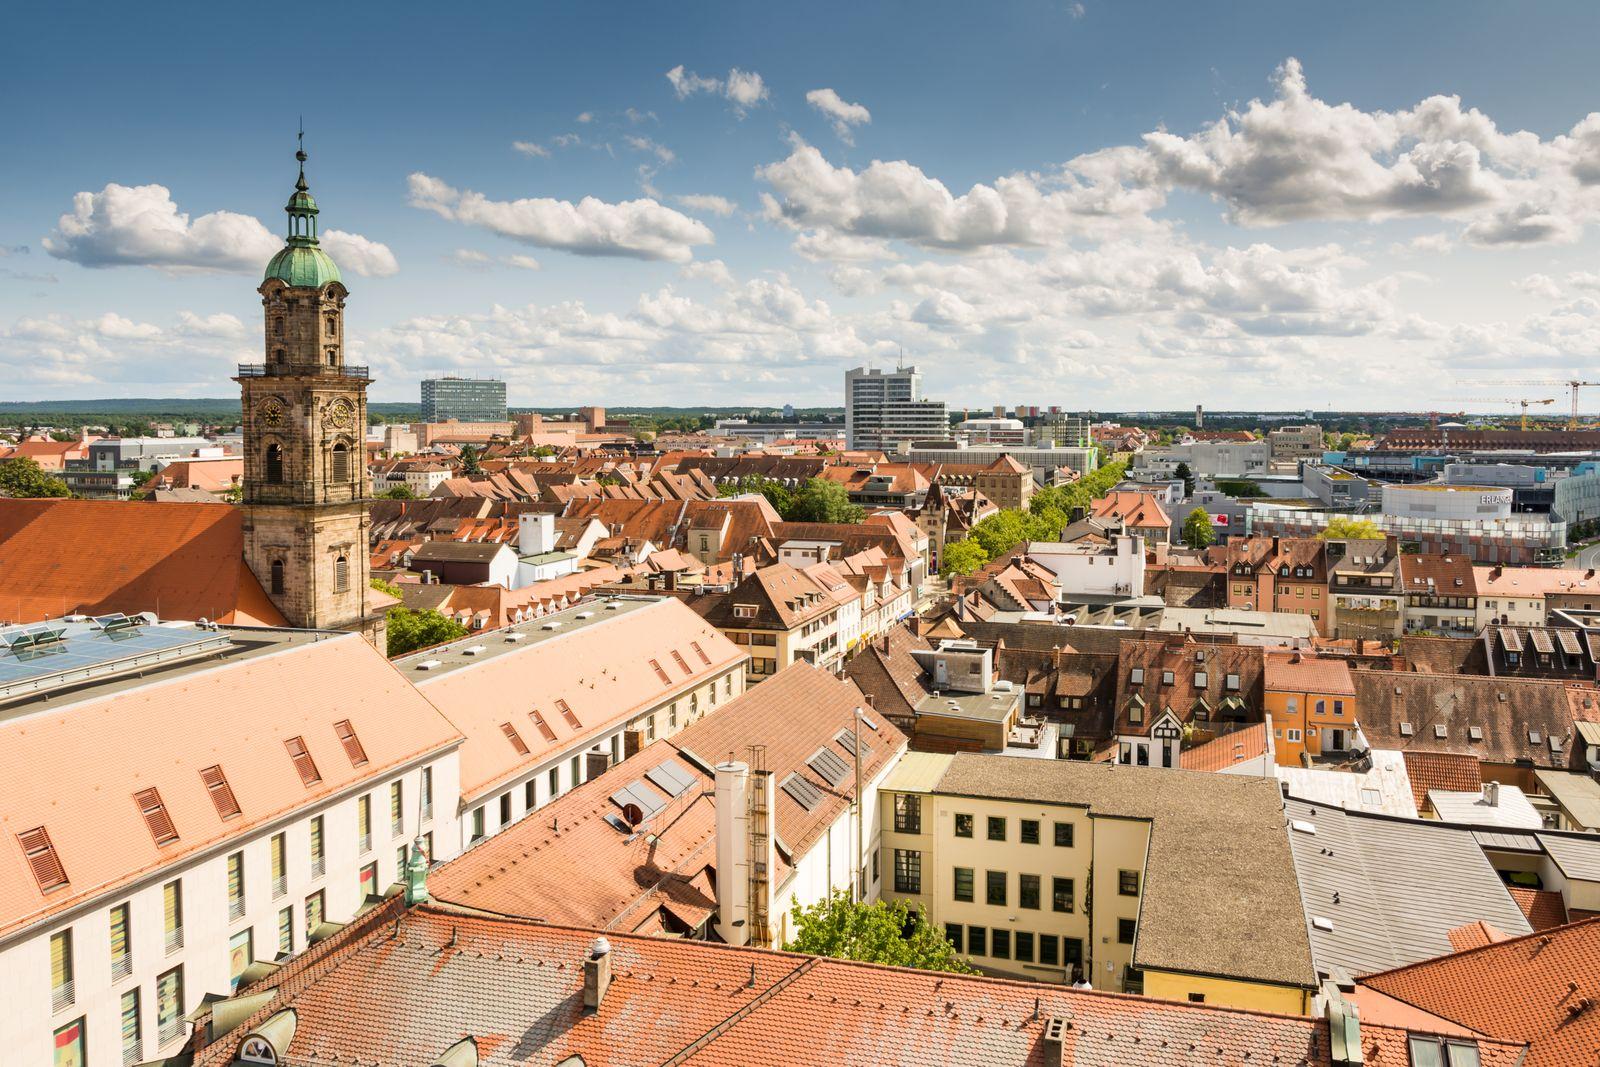 Aerial view over the city of Erlangen